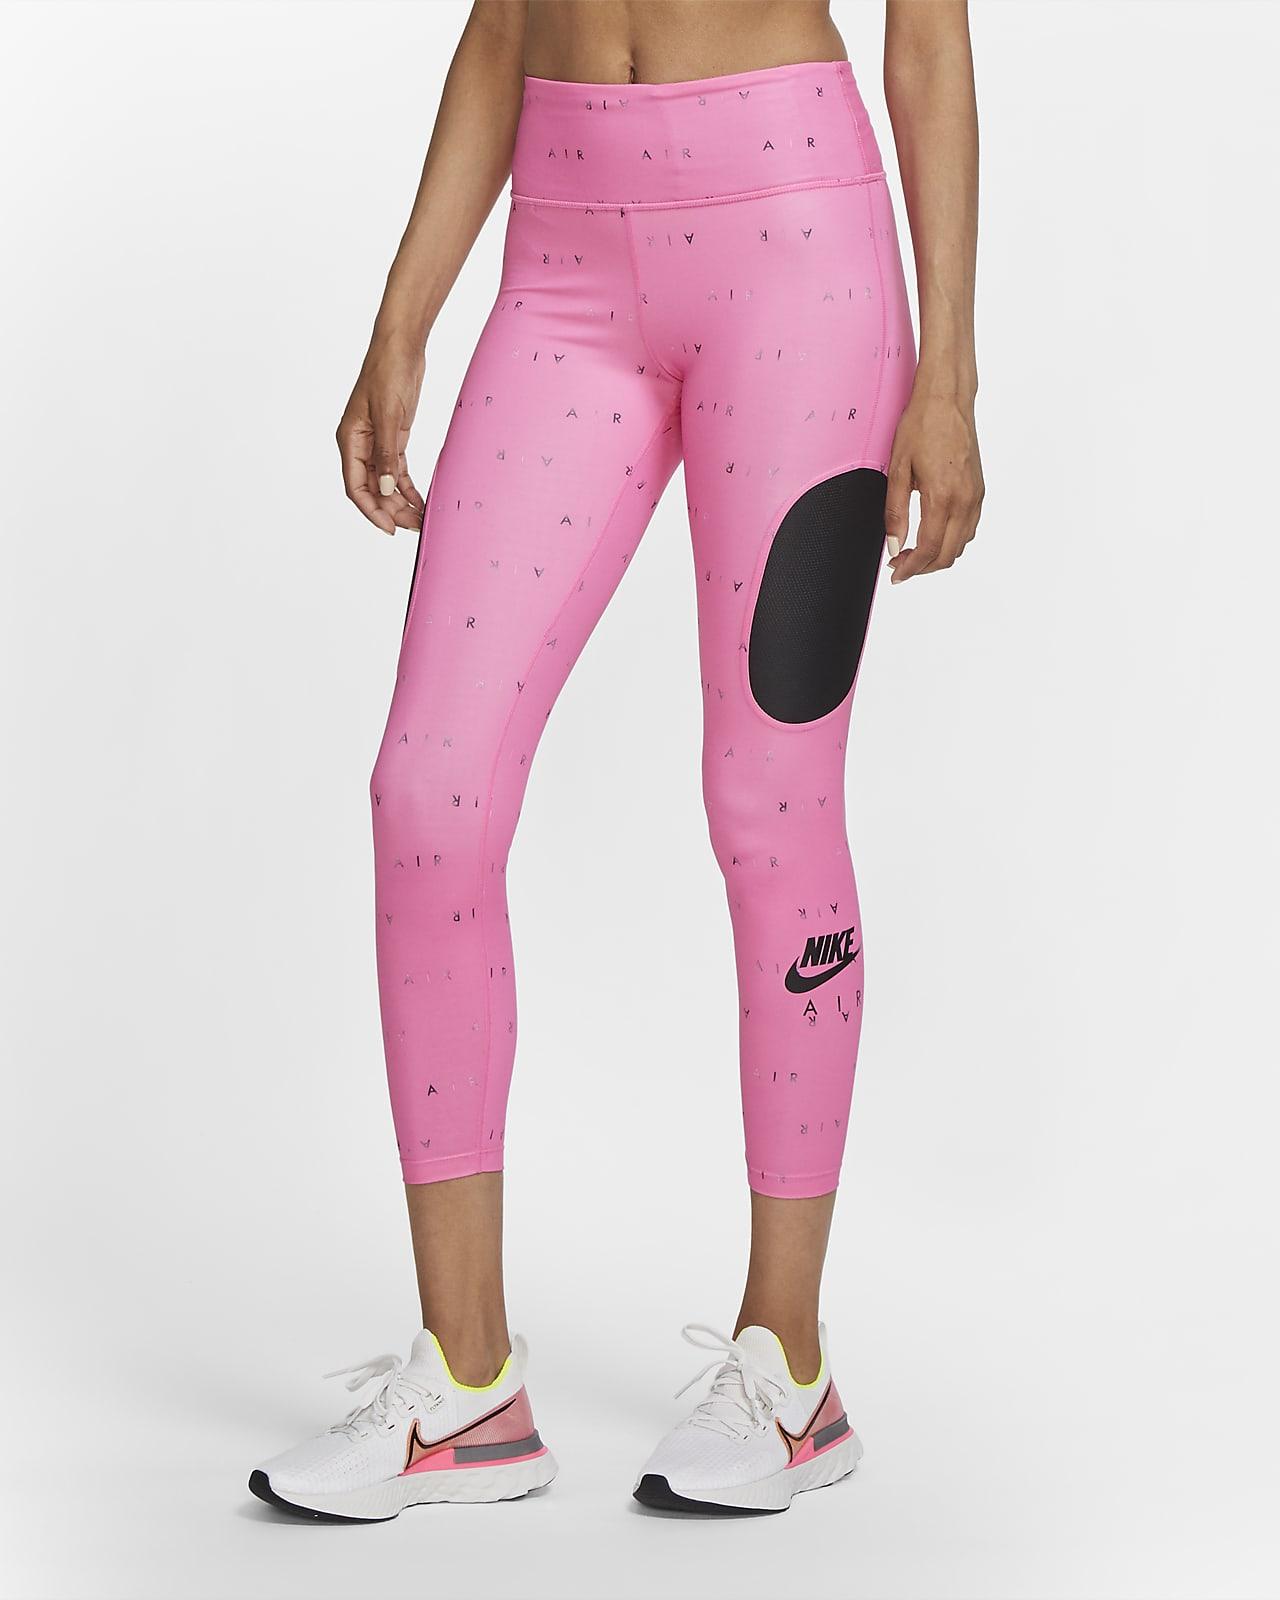 Nike Air Women's 7/8 Running Tights